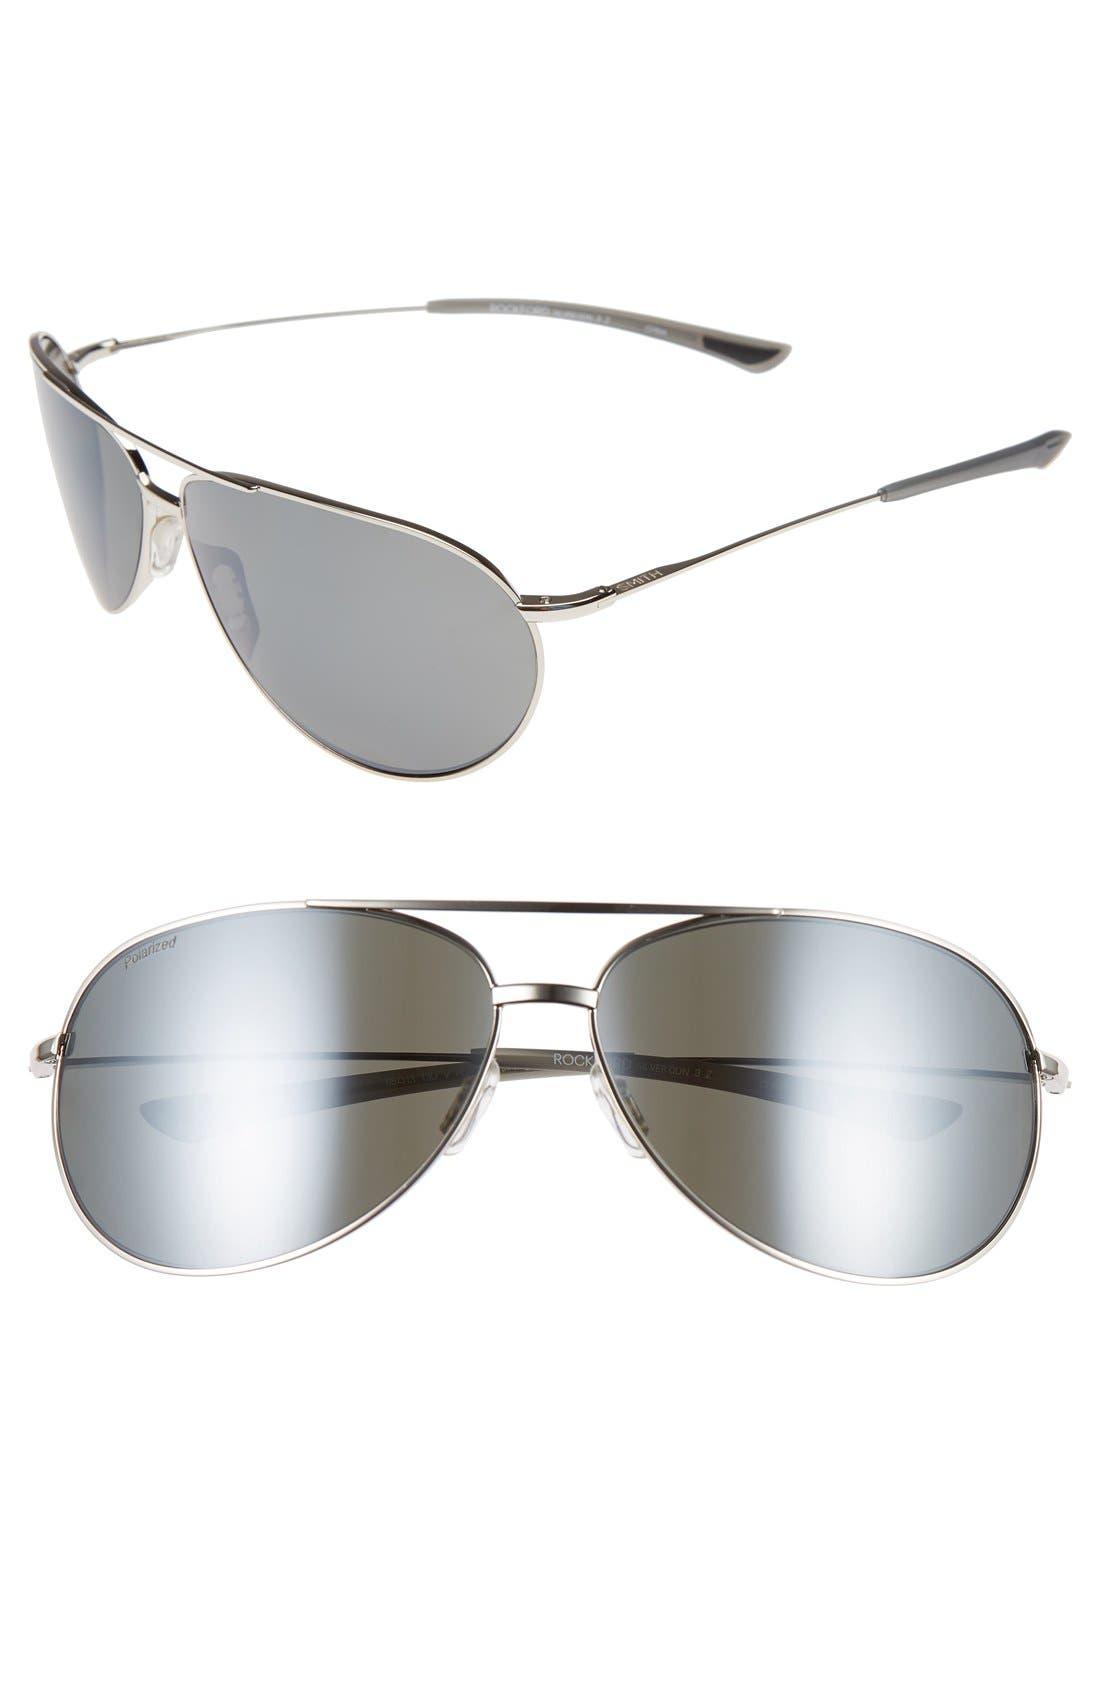 Alternate Image 1 Selected - Smith 'Rockford' 65mm Polarized Aviator Sunglasses